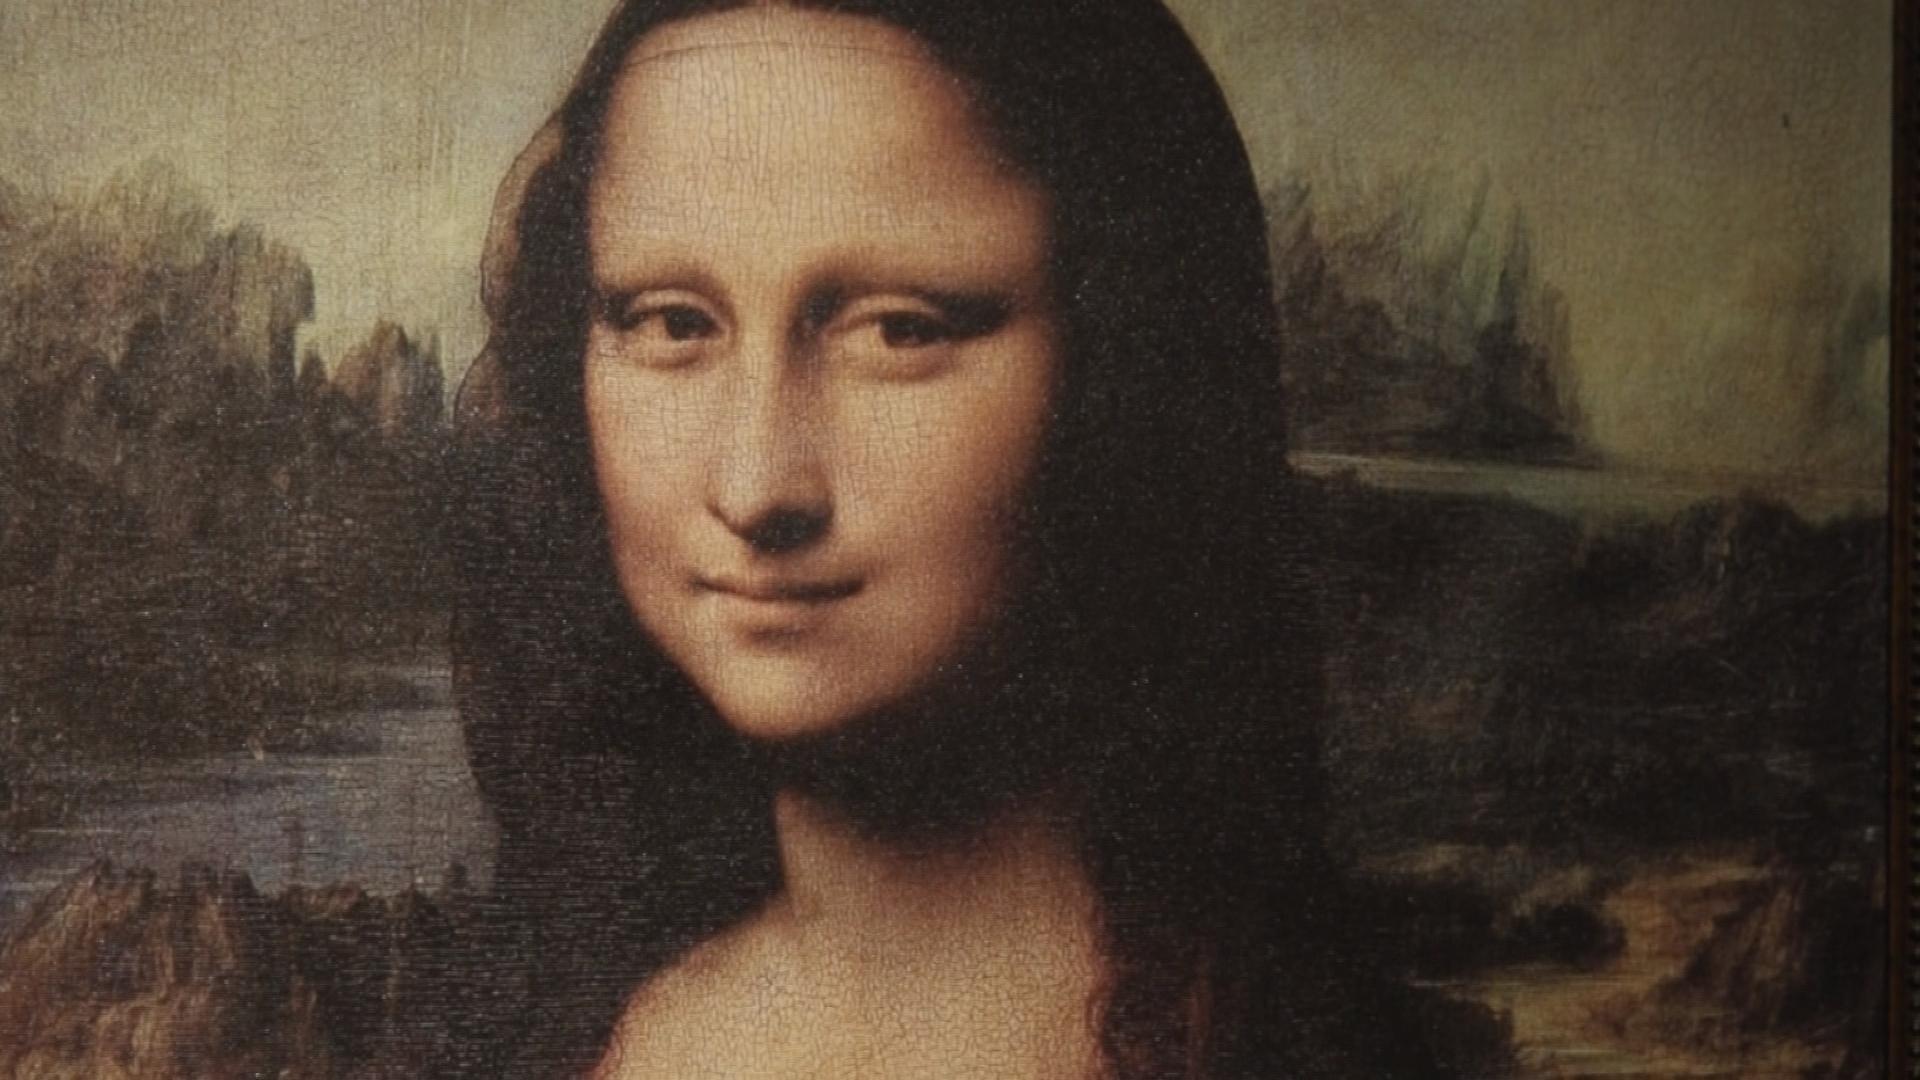 Bức tranh nàng Mona Lisa lừng danh của danh họa Leonardo da Vinci. Ảnh: Mafiamedia